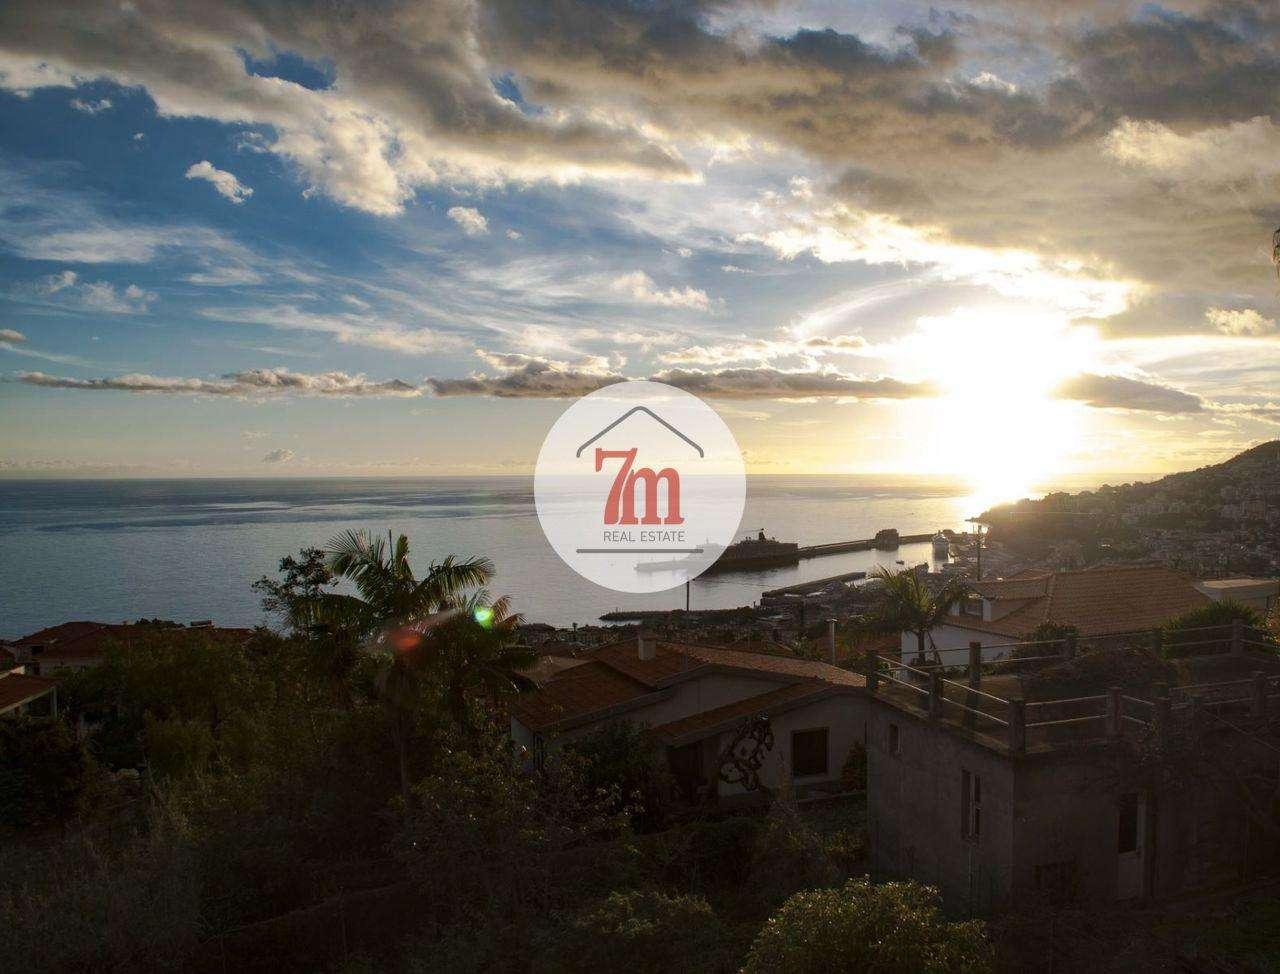 Terreno para comprar, Santa Maria Maior, Ilha da Madeira - Foto 1